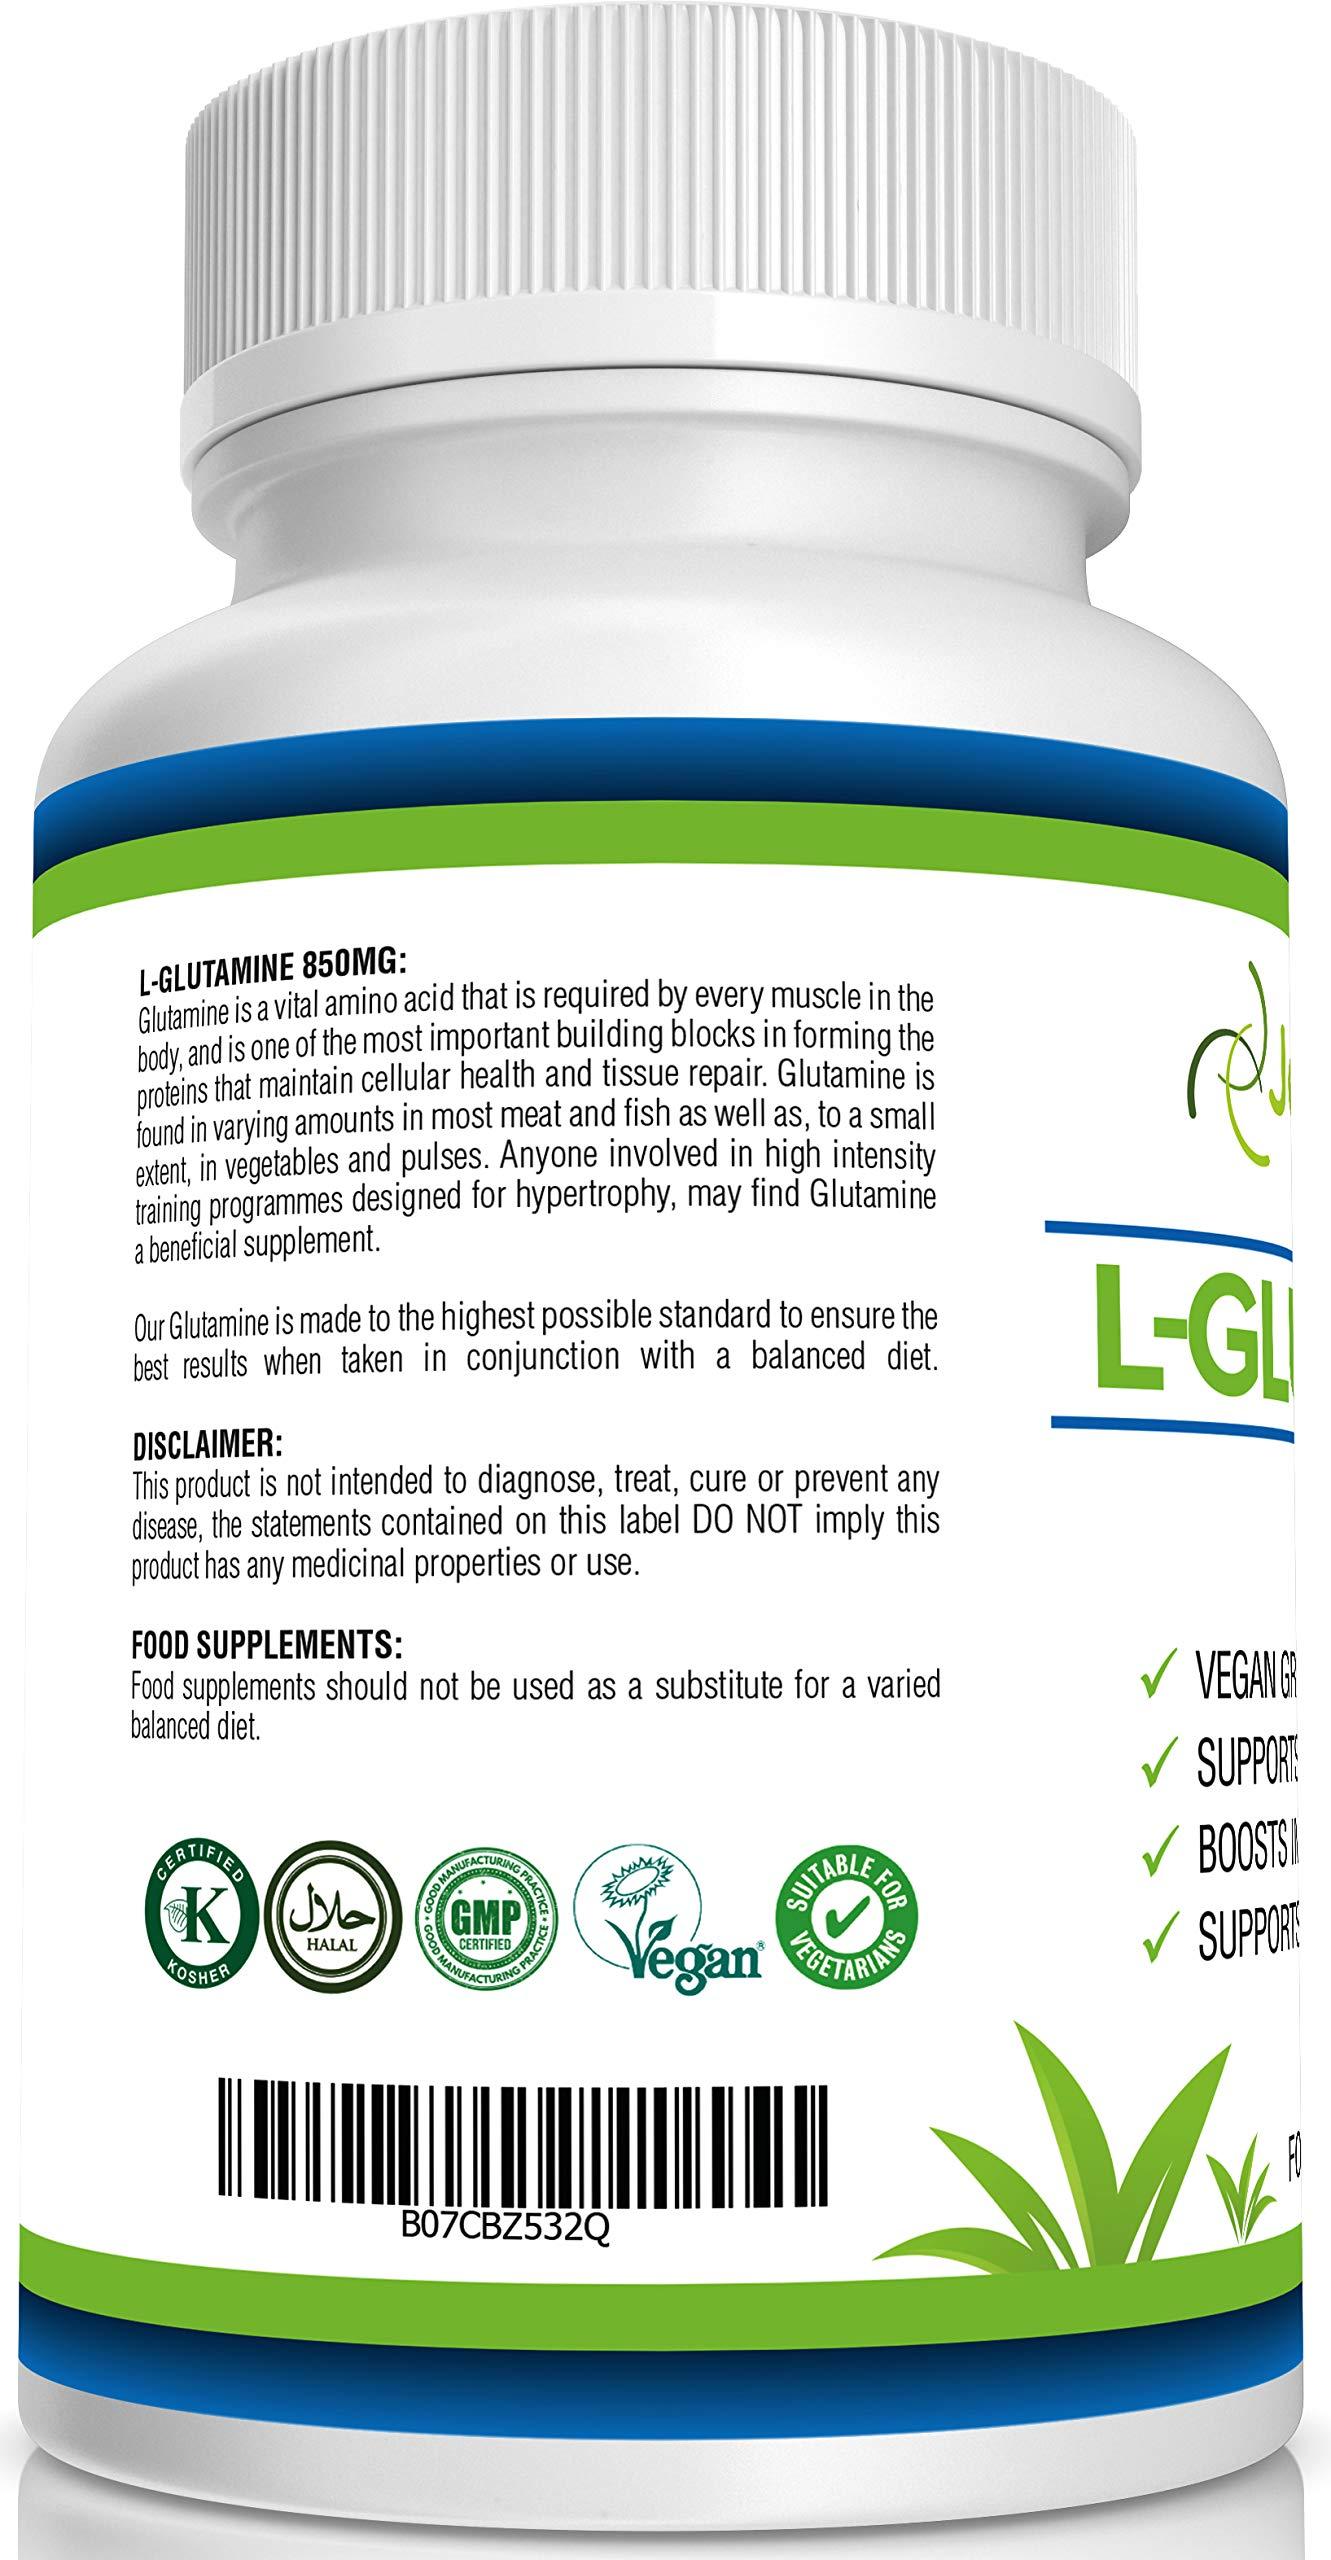 L-GLUTAMINE Capsules by JeaKen - 850mg x 60 Higher Strength